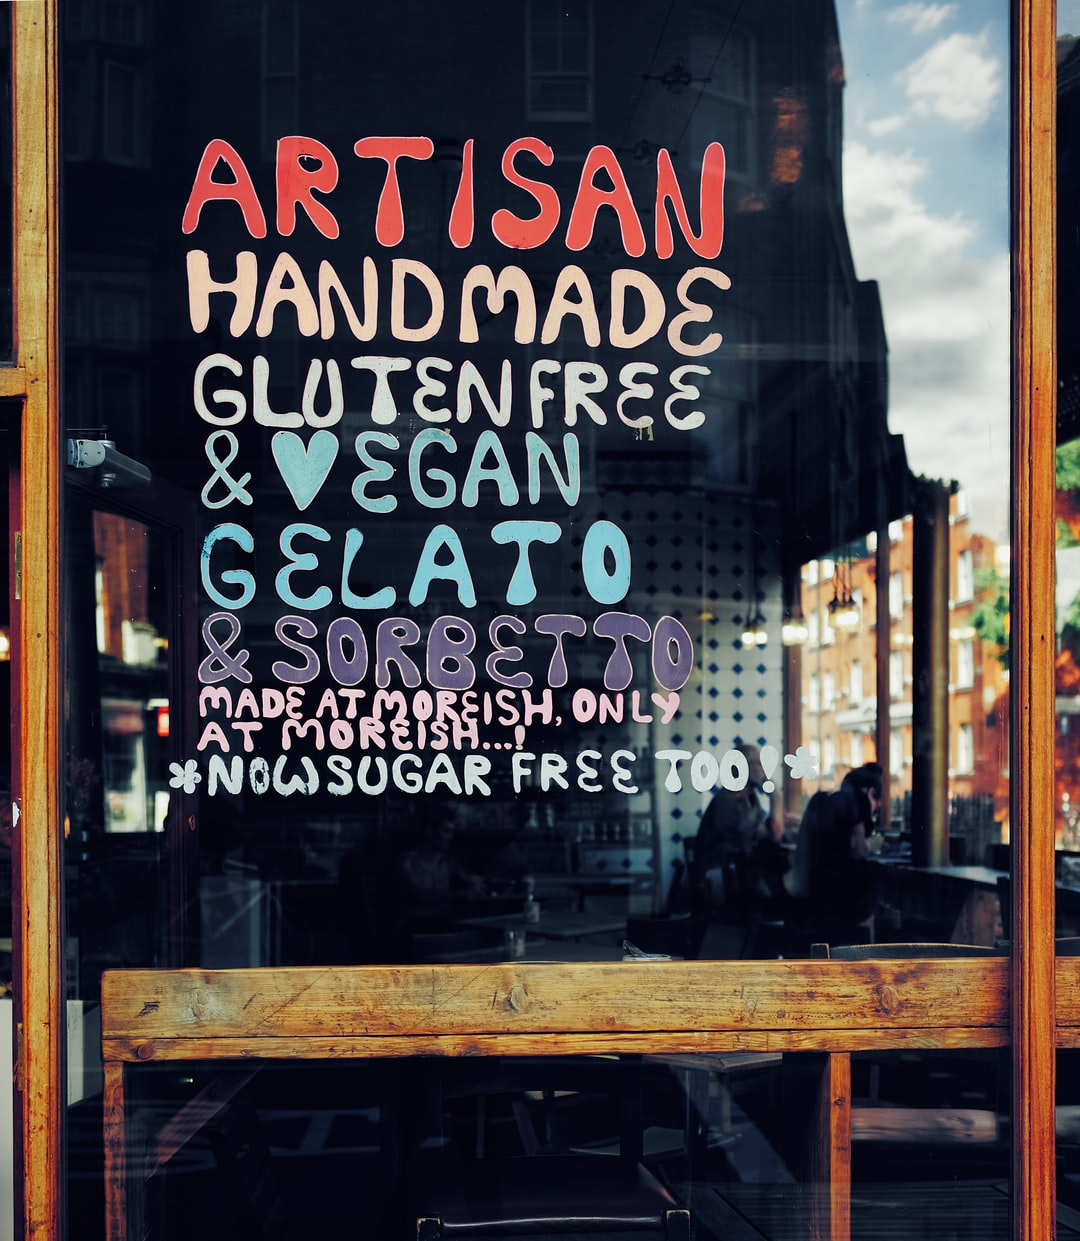 Artisan Handmade Gluten Free & Vegan